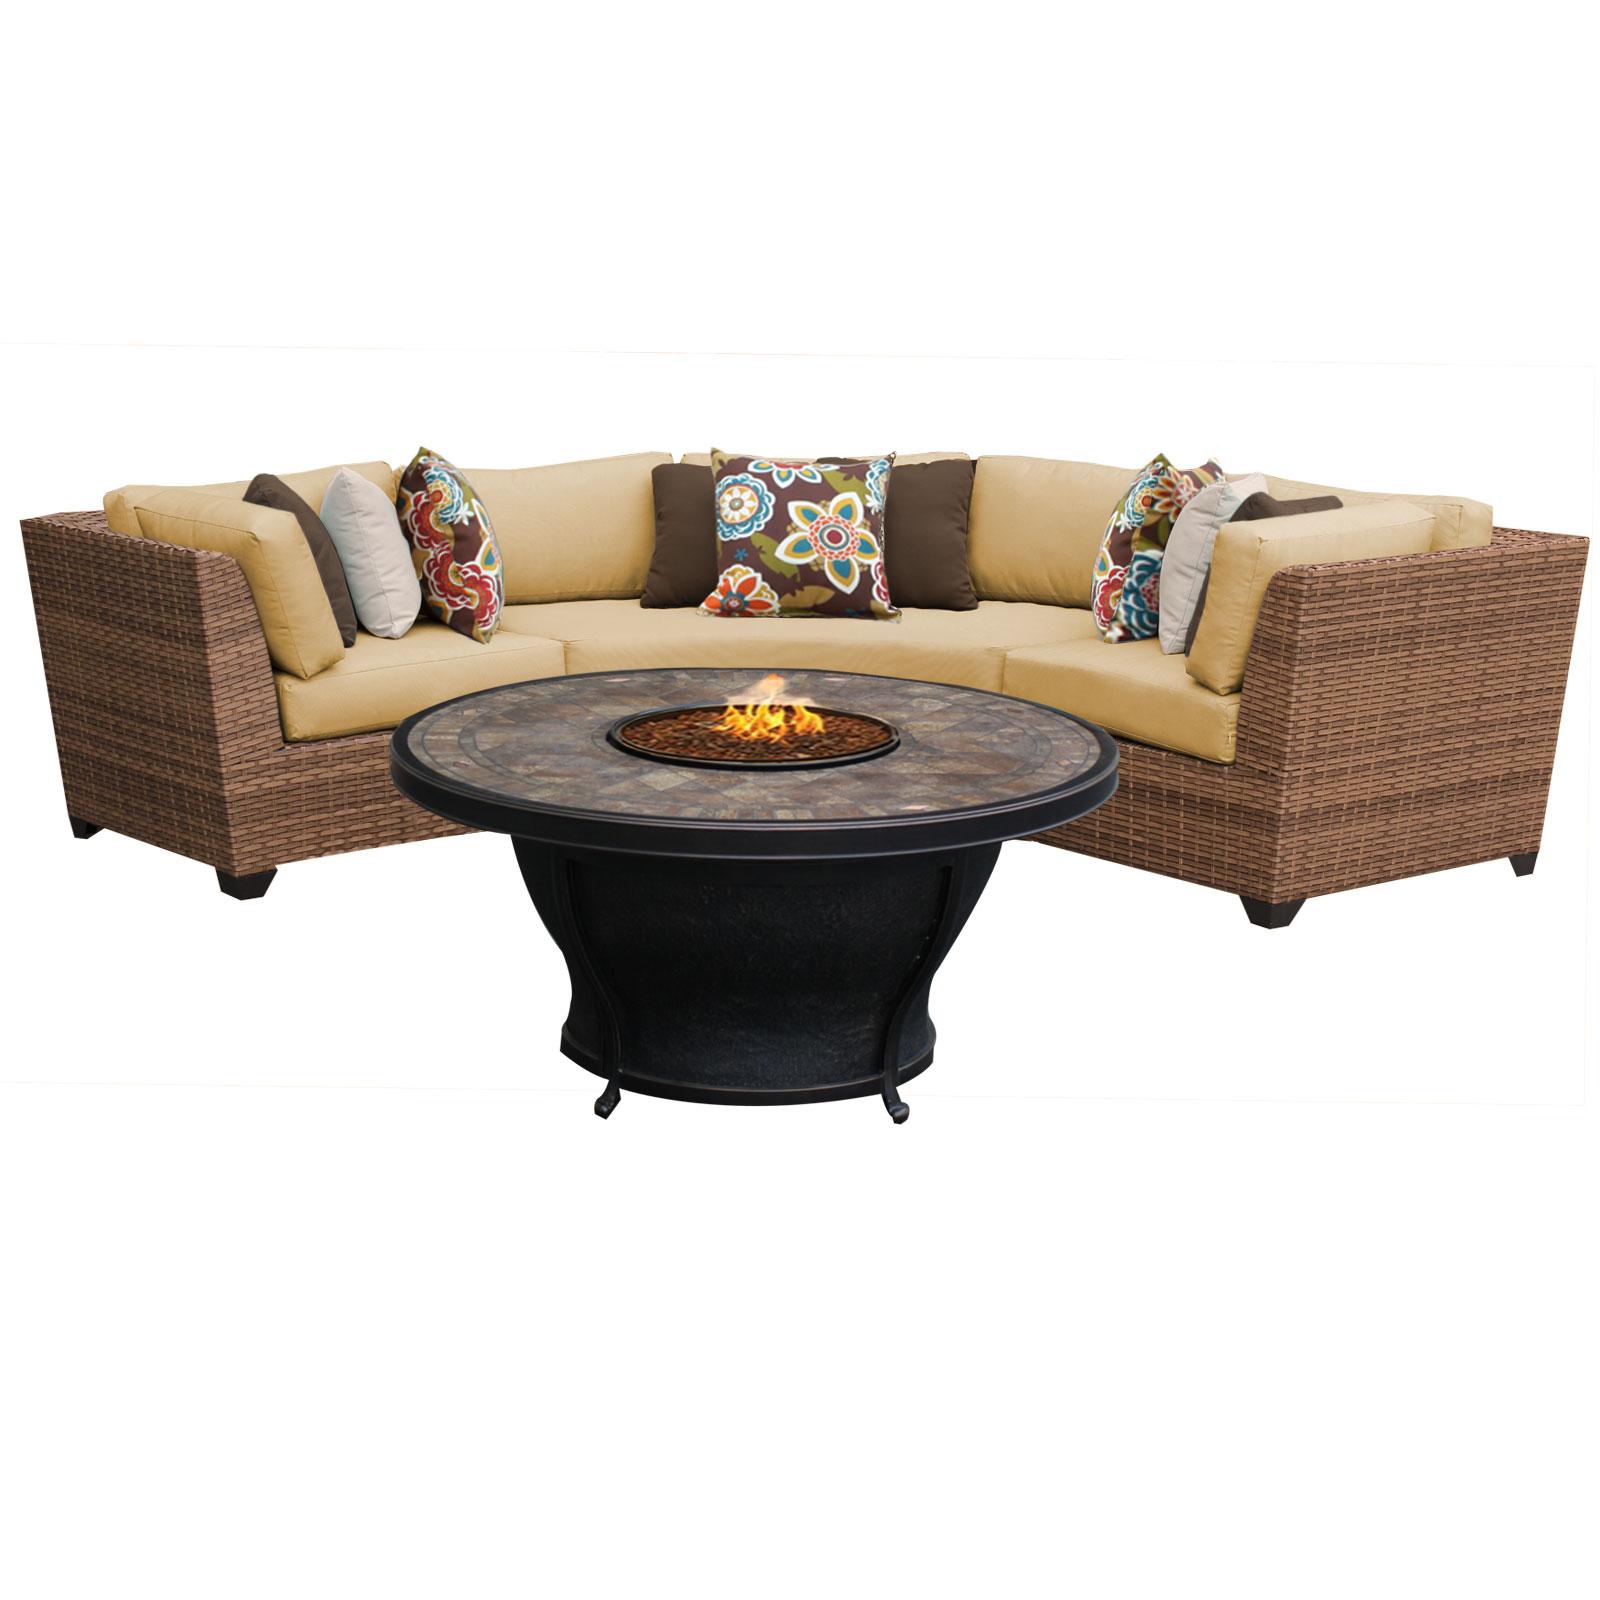 Tuscan 4 Piece Outdoor Wicker Patio Furniture Set 04e